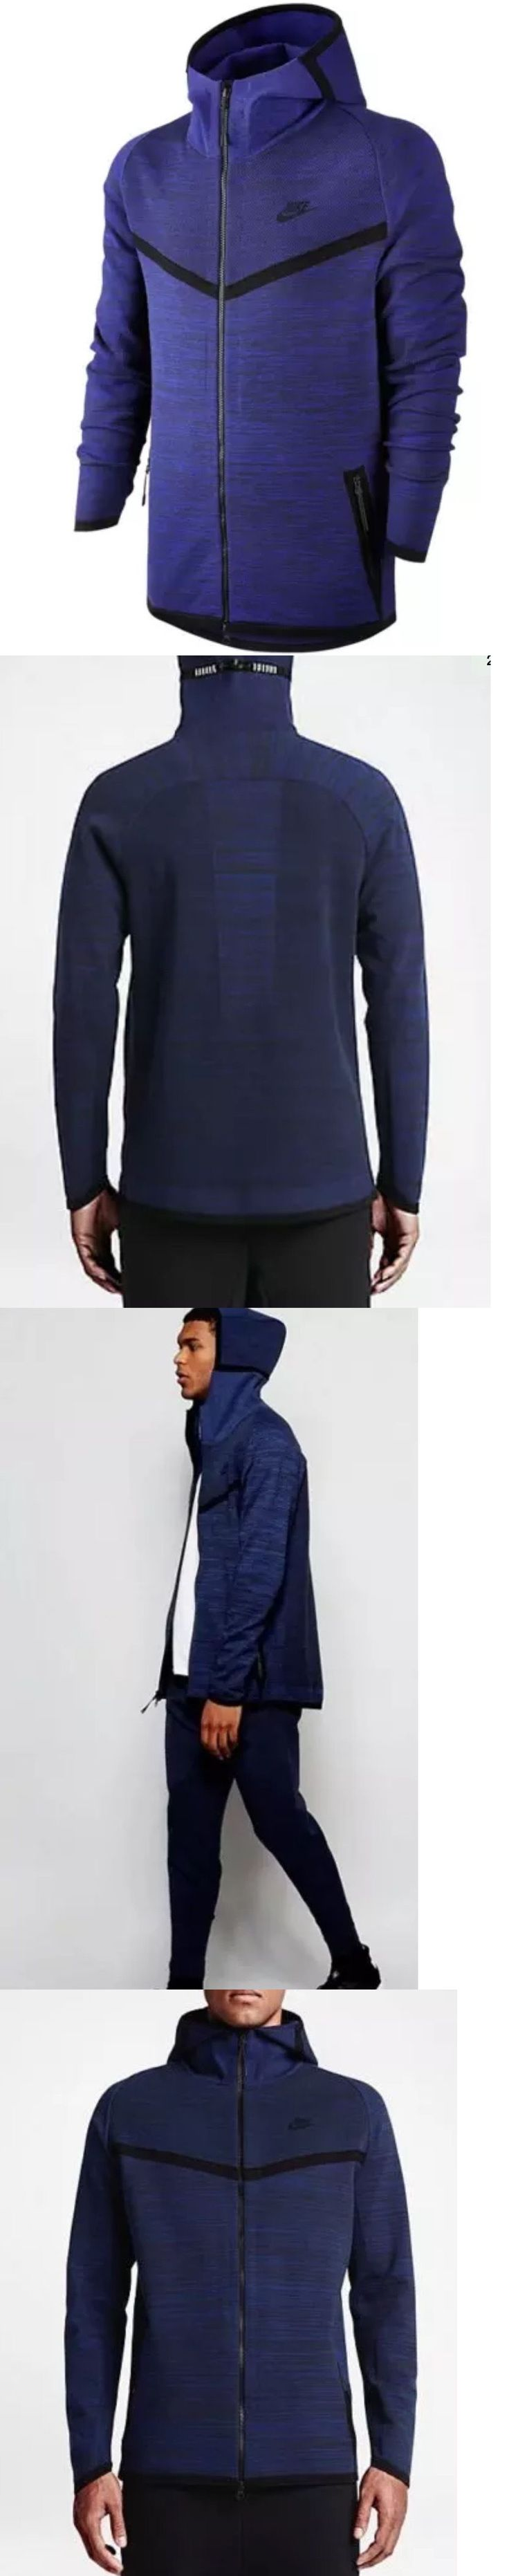 Men Athletics: Nike $250 Mens Tech Knit Windrunner Hoodie Jacket - Blue/Black (728685 451) Xl -> BUY IT NOW ONLY: $99.95 on eBay!